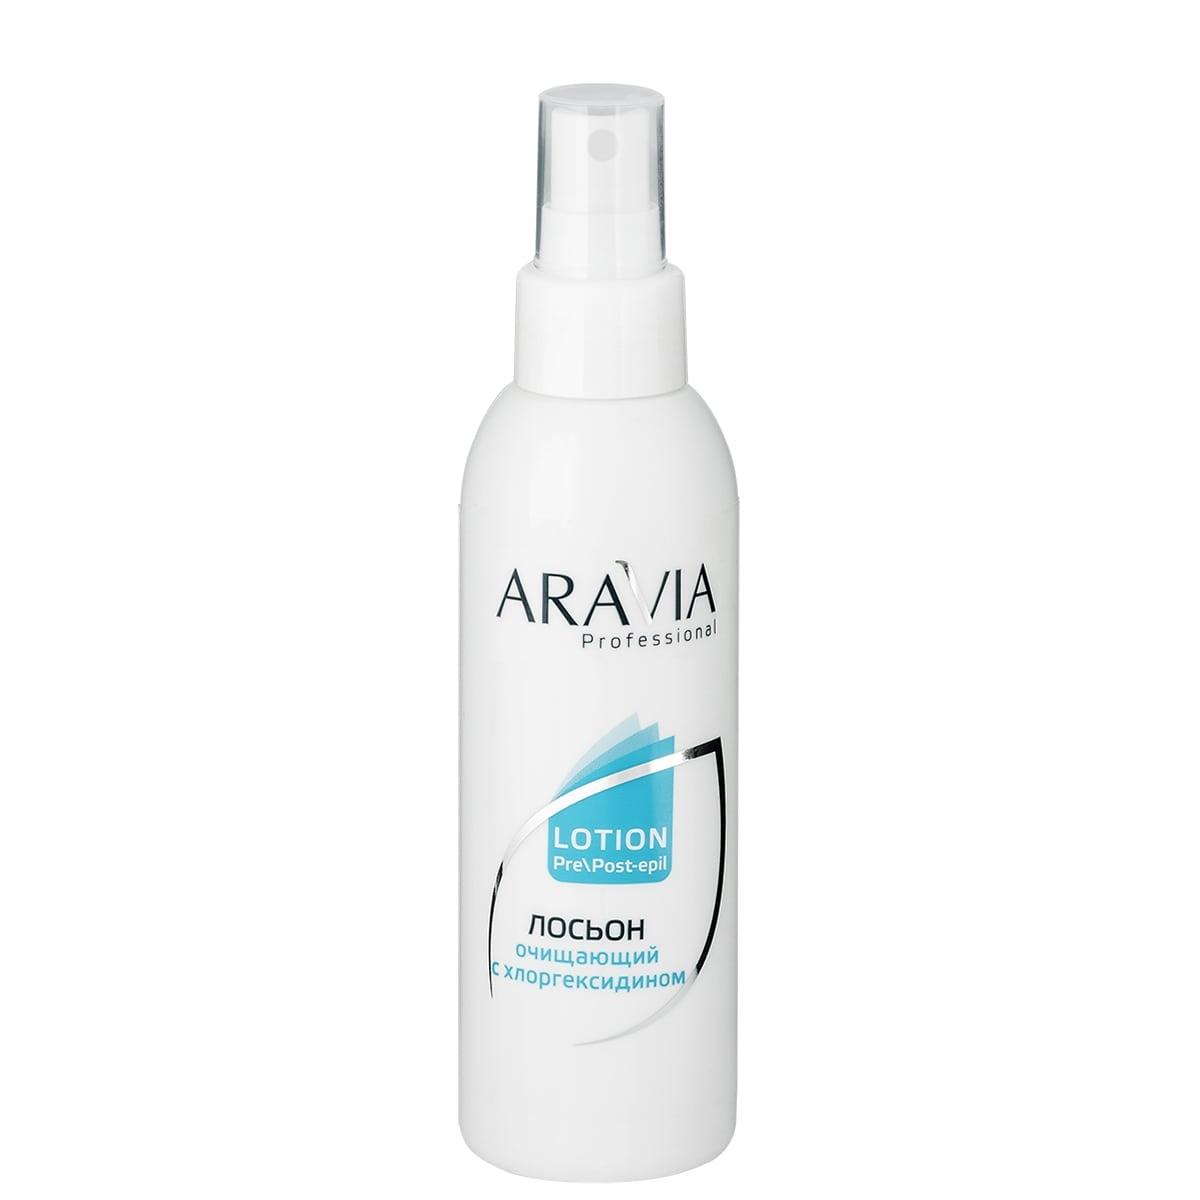 ARAVIA Лосьон очищающий с хлоргексидином, 150 мл нюкс магазин косметики